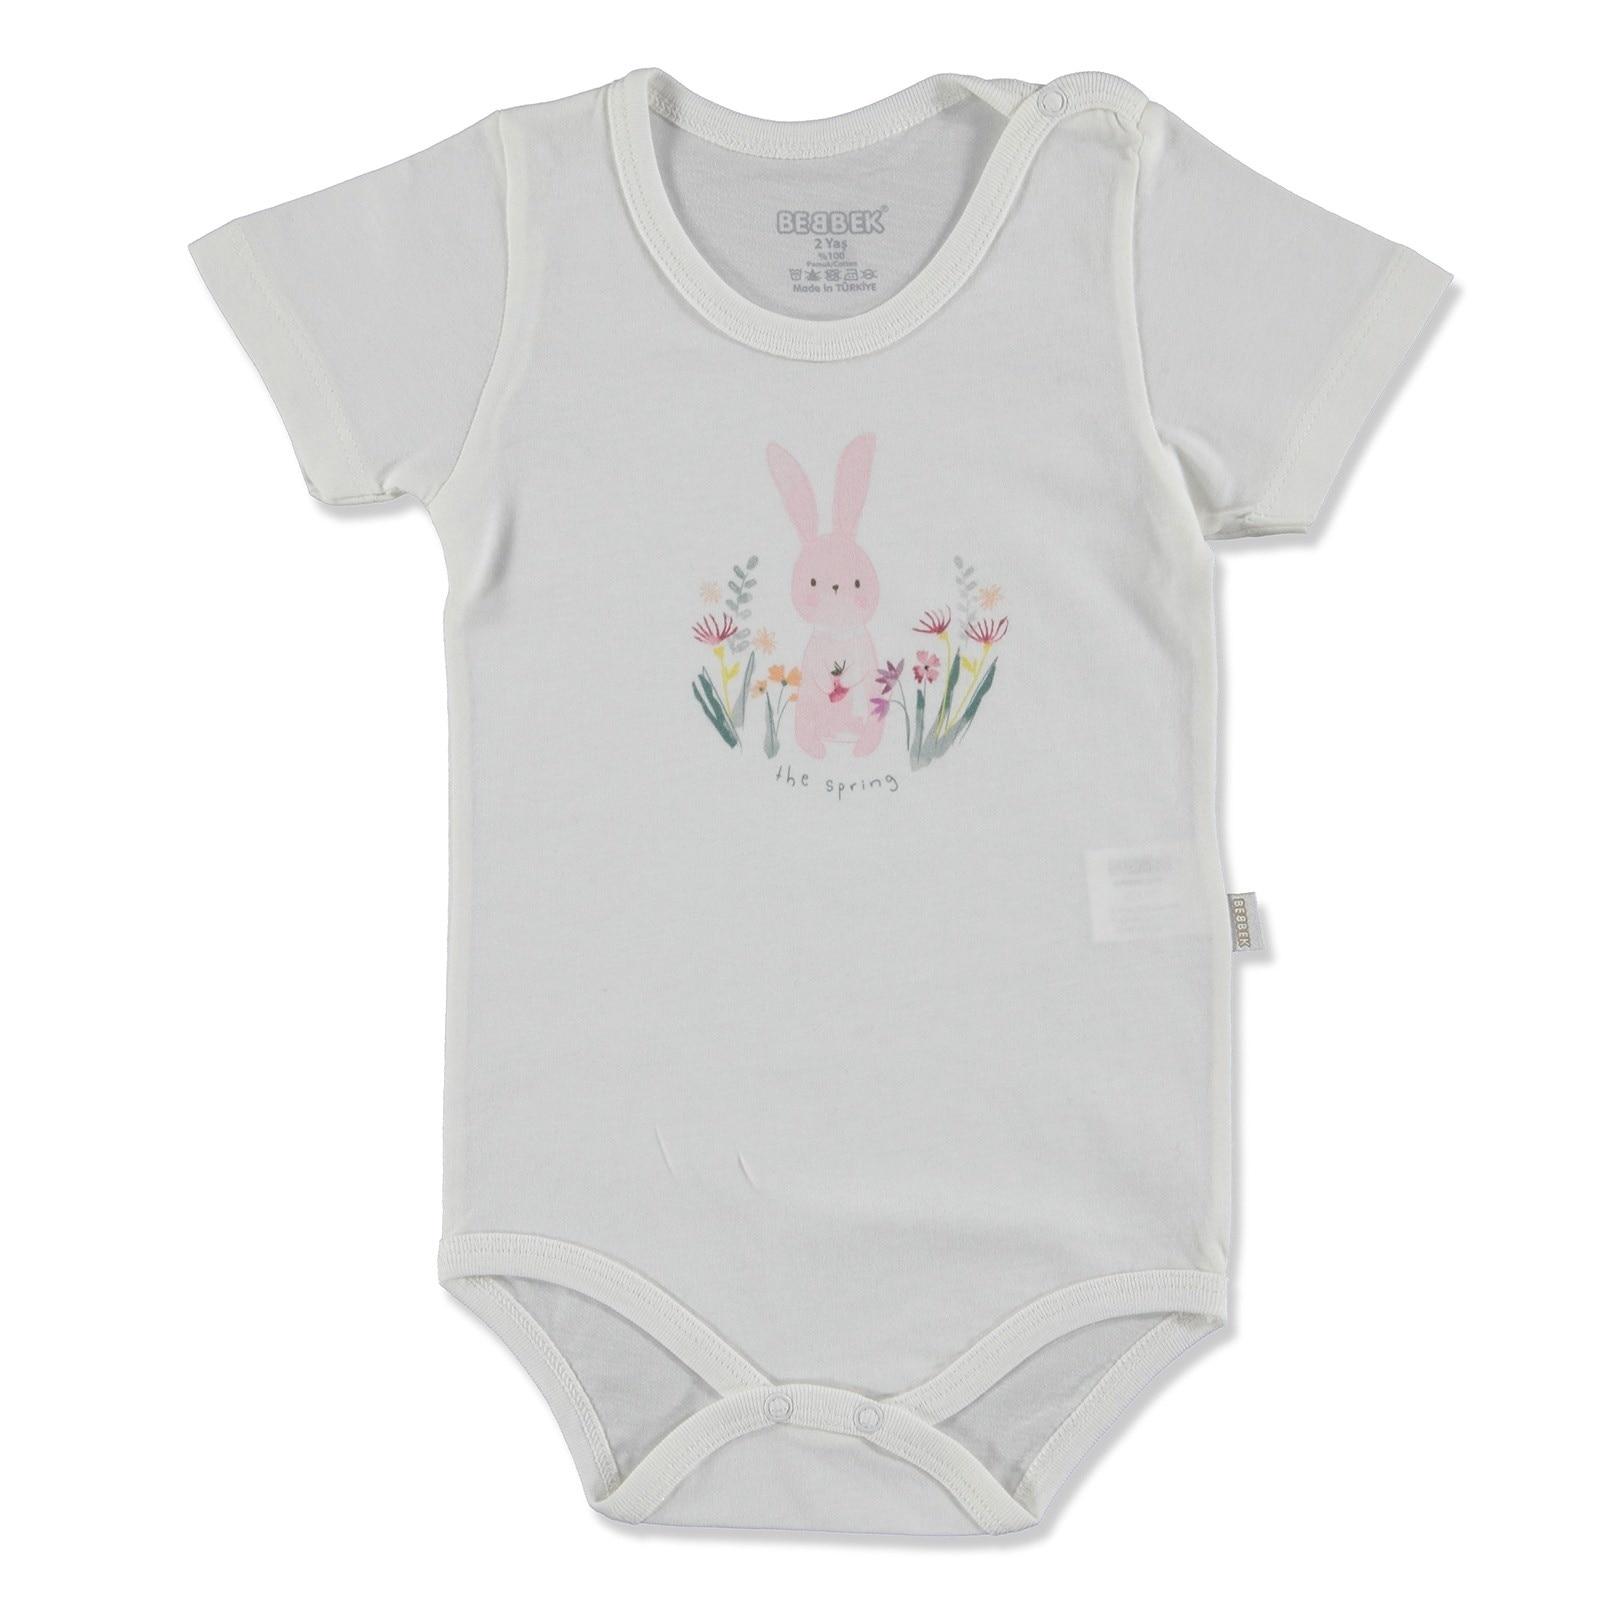 Ebebek Bebbek Summer Baby Girl Spring Supreme Crew-Neck Bodysuit